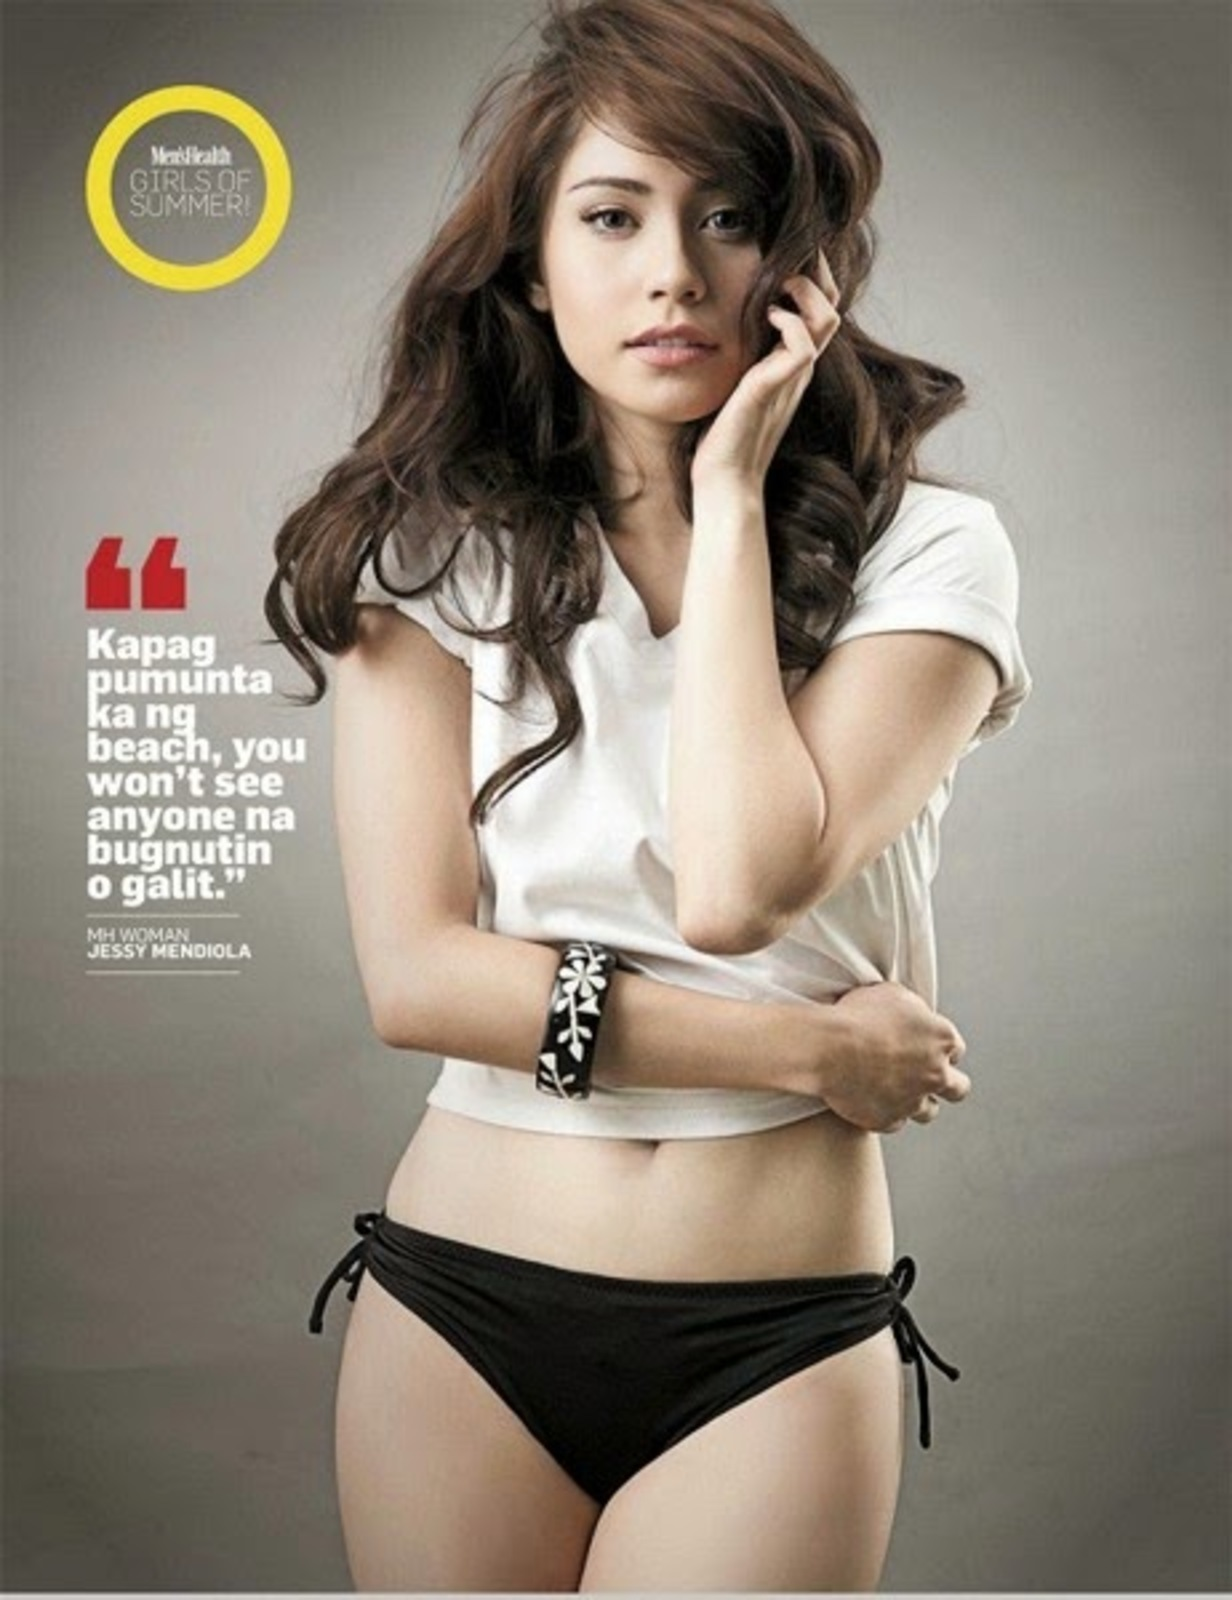 jessy mendiola sexy mens health magazine bikini pics 02